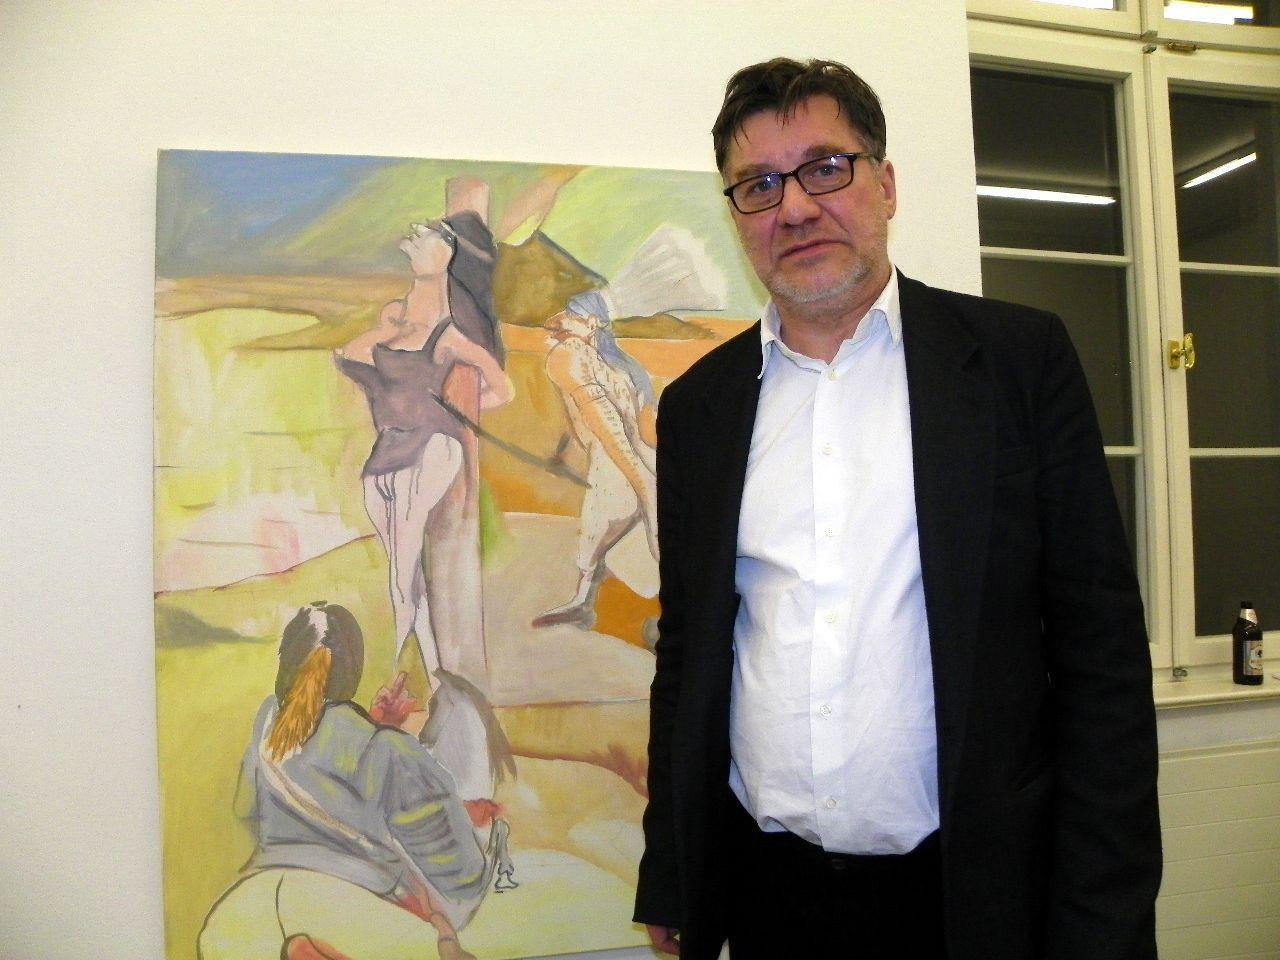 Künstler Siegfried Anzinger